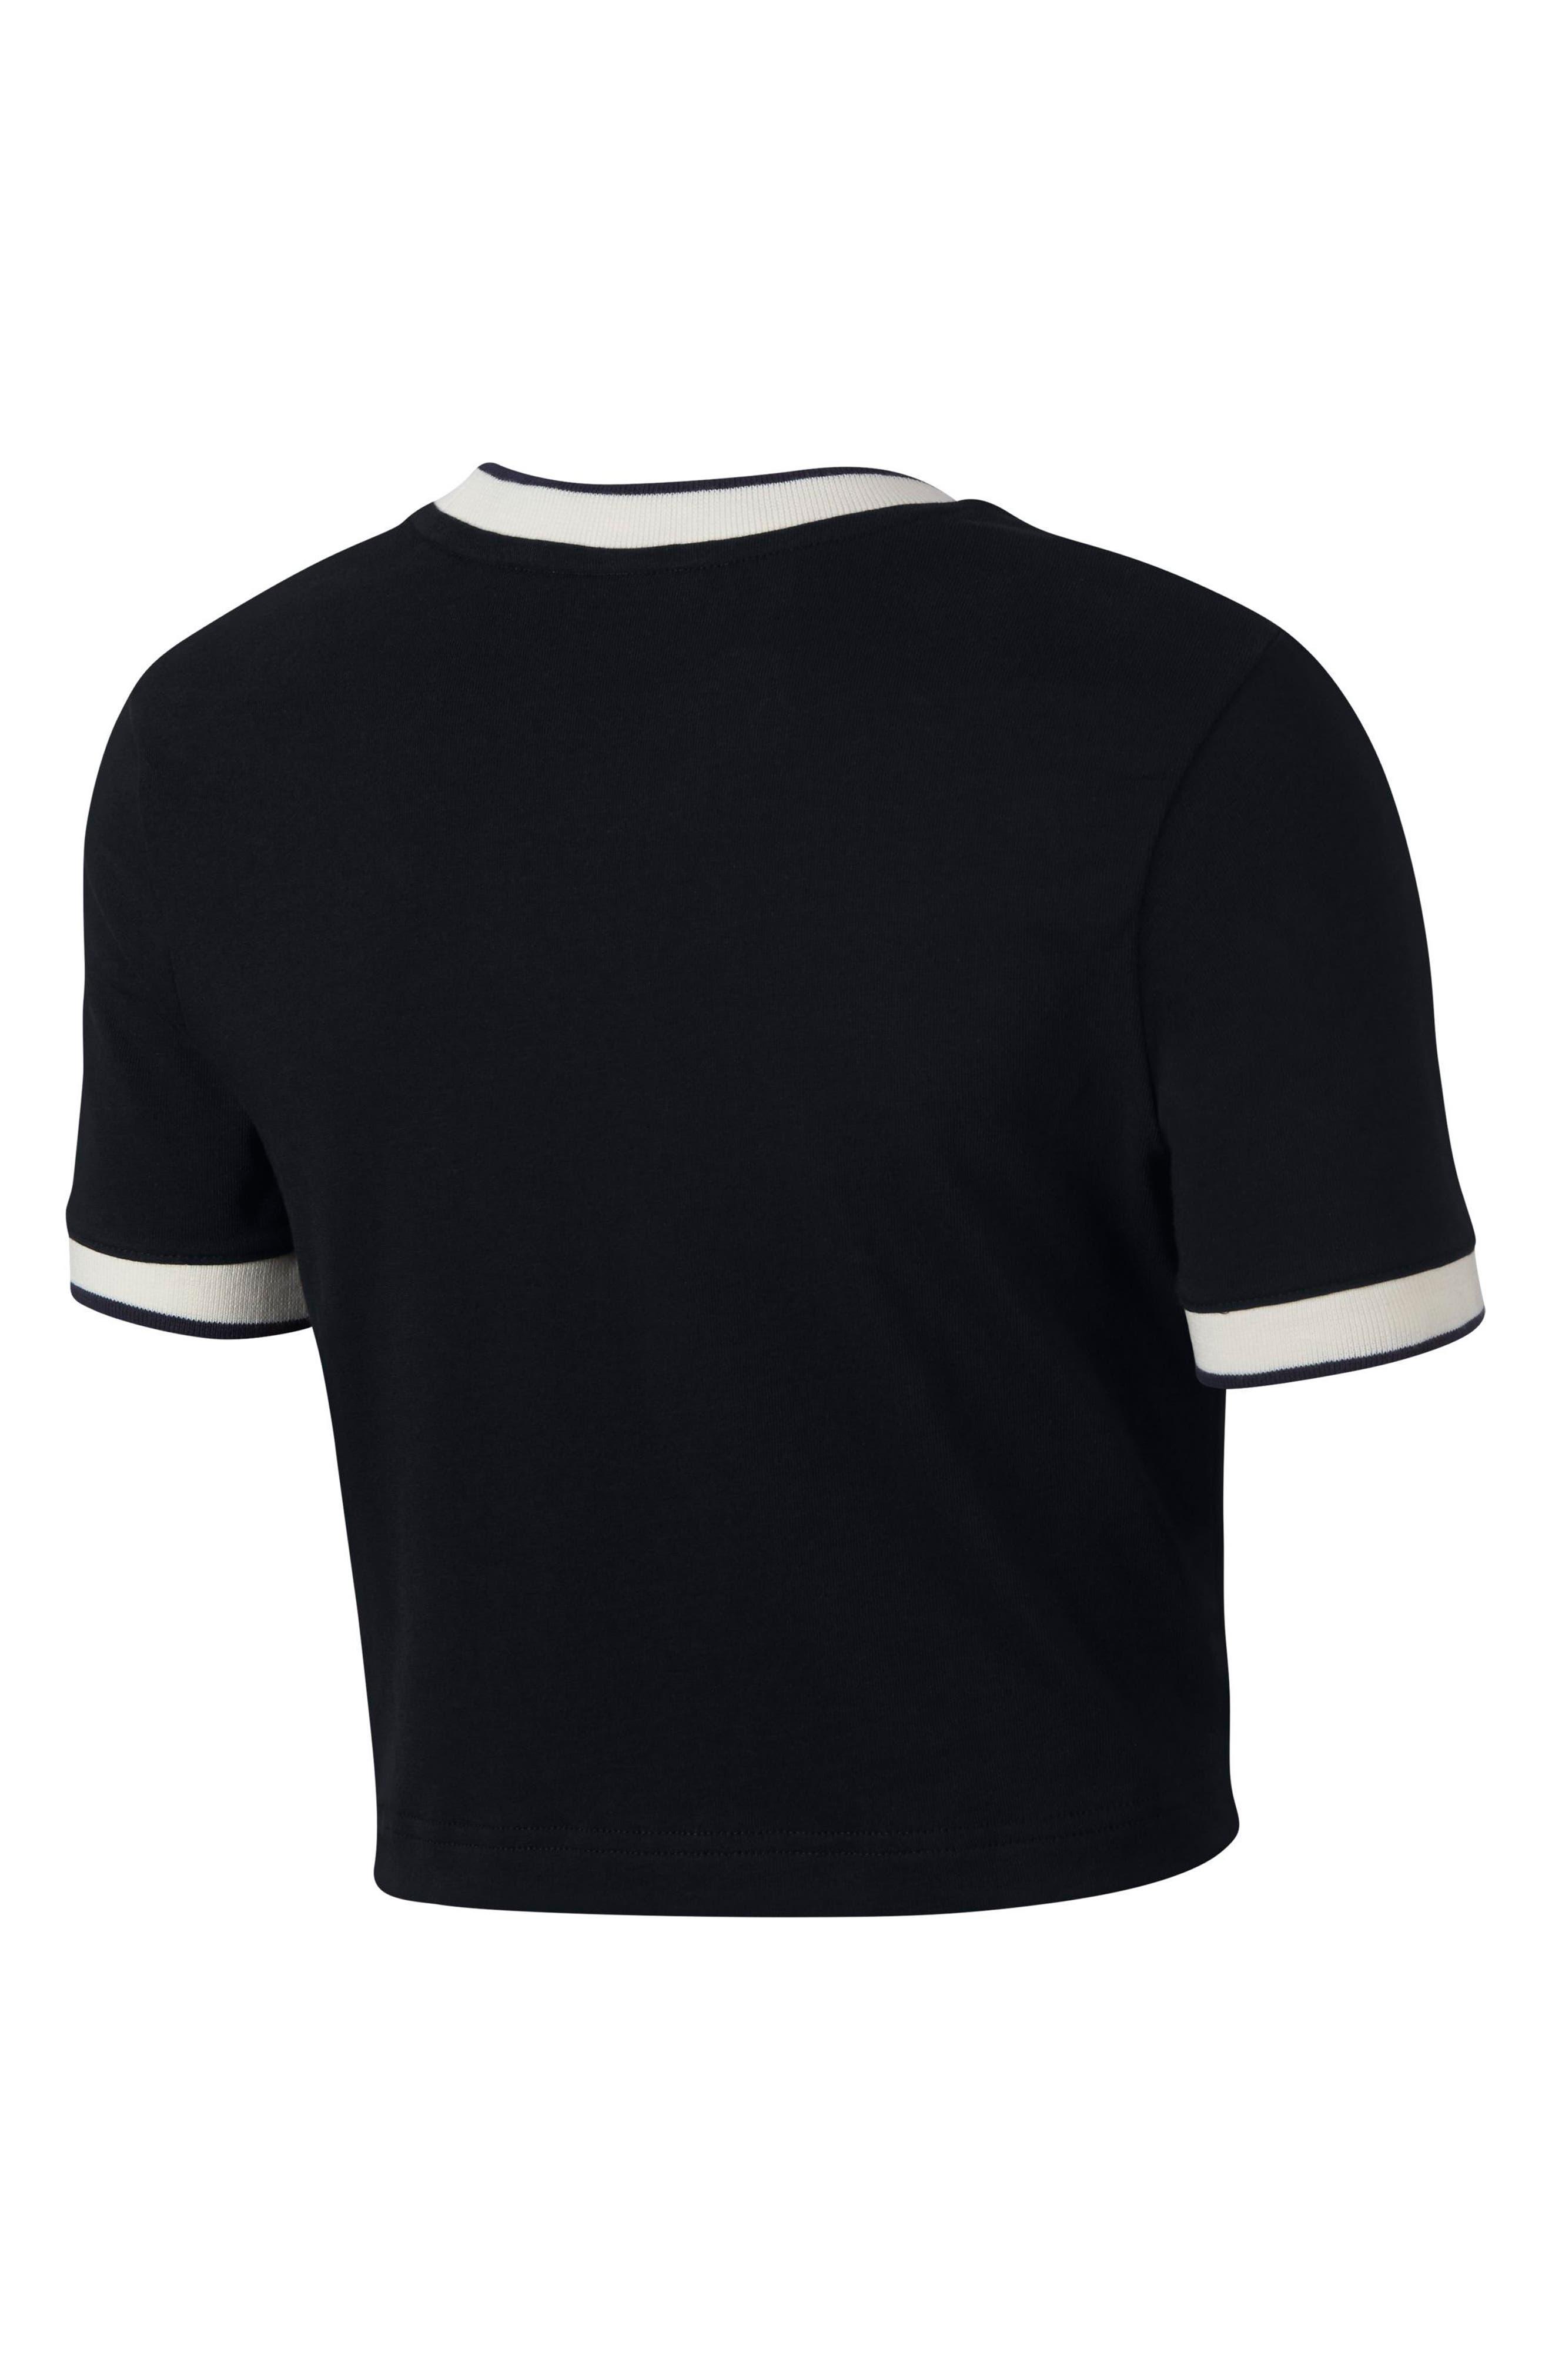 Sportswear Crop Top,                             Alternate thumbnail 9, color,                             010